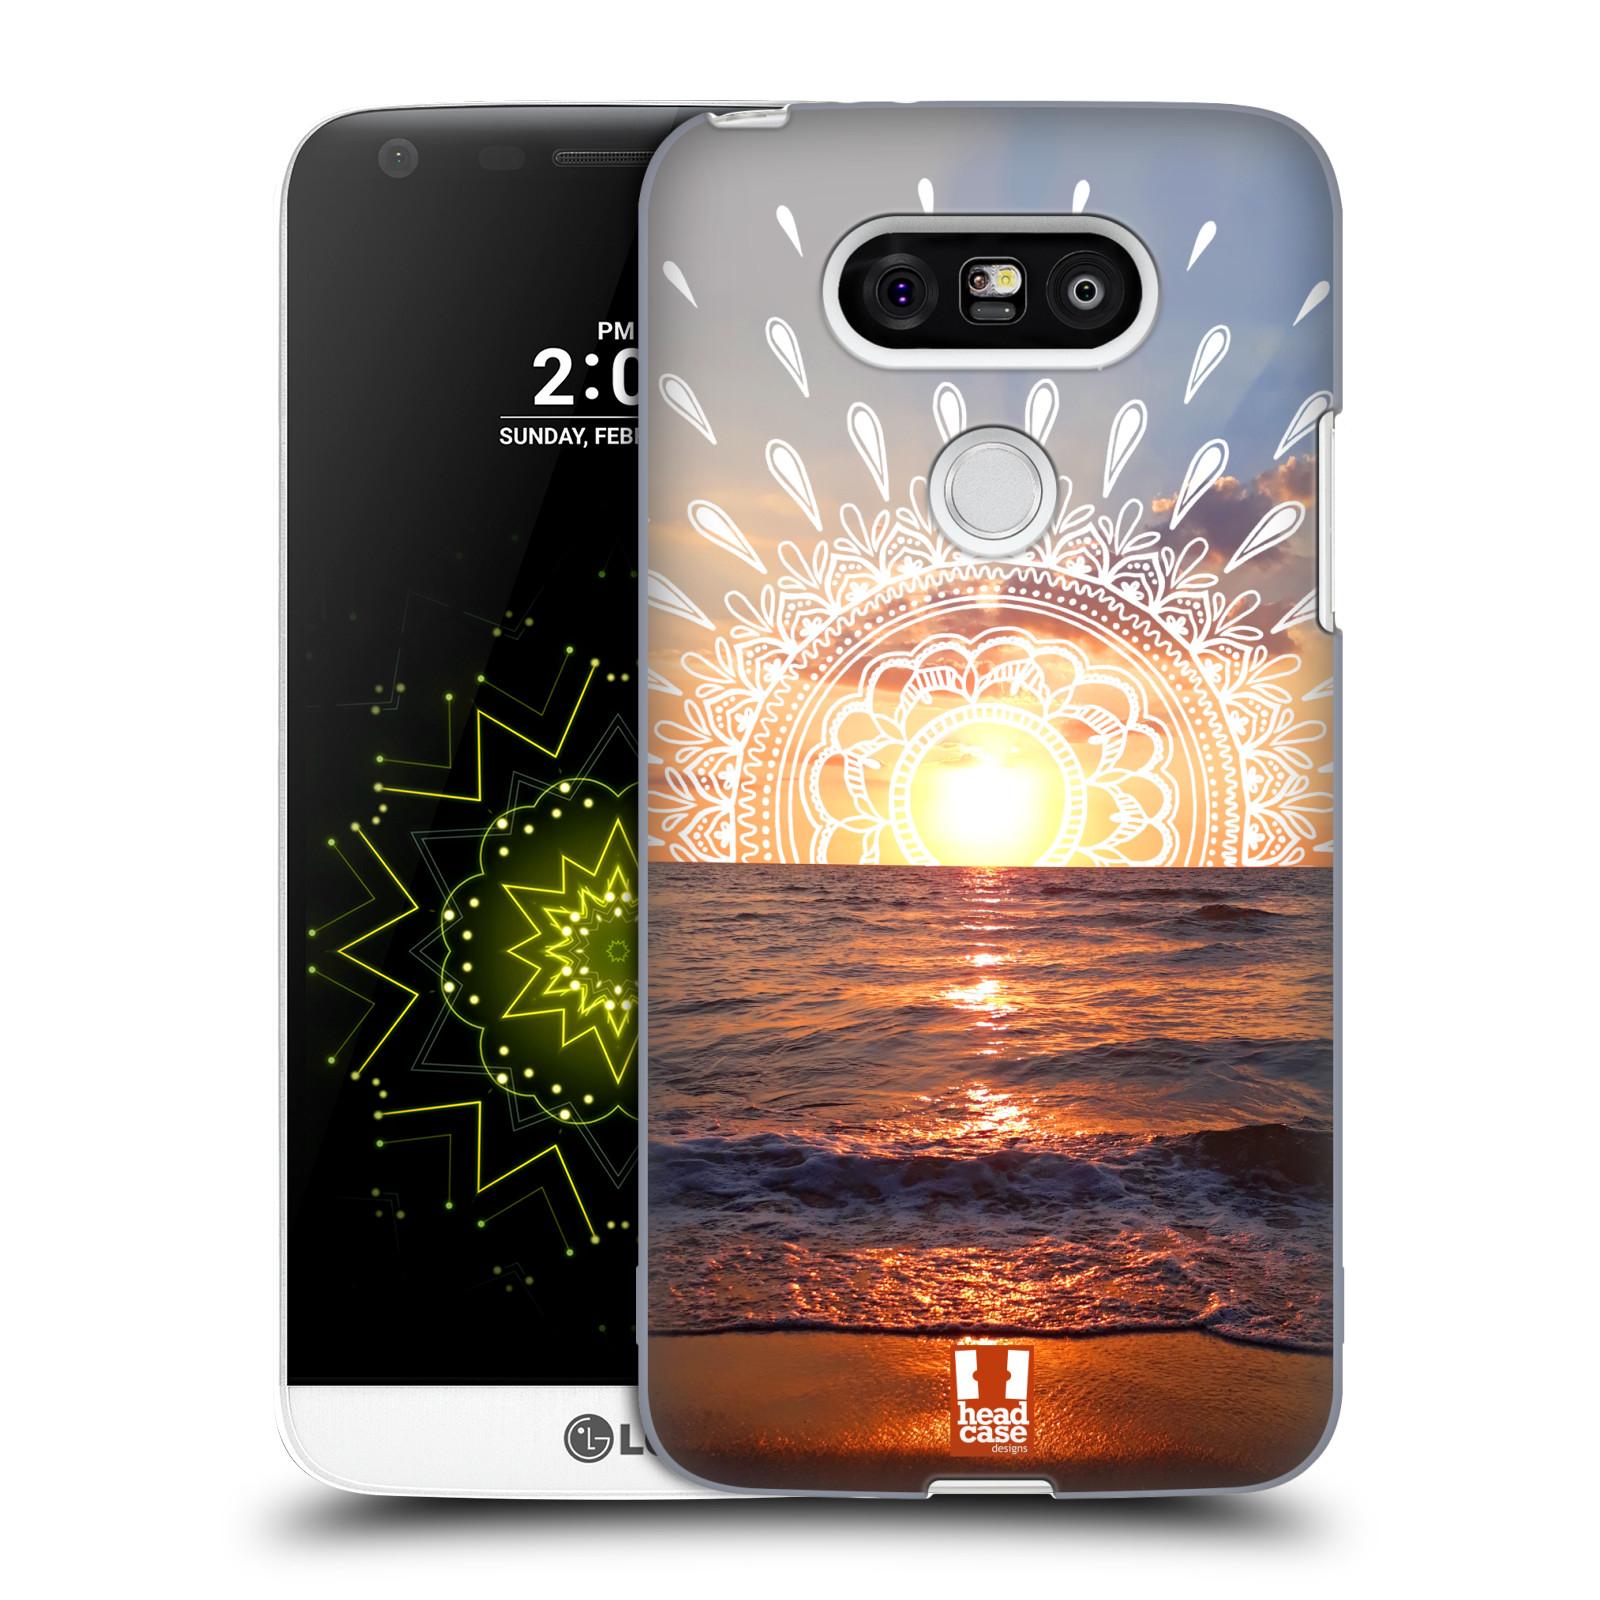 Pouzdro na mobil LG G5 - HEAD CASE - doodle západ slunce